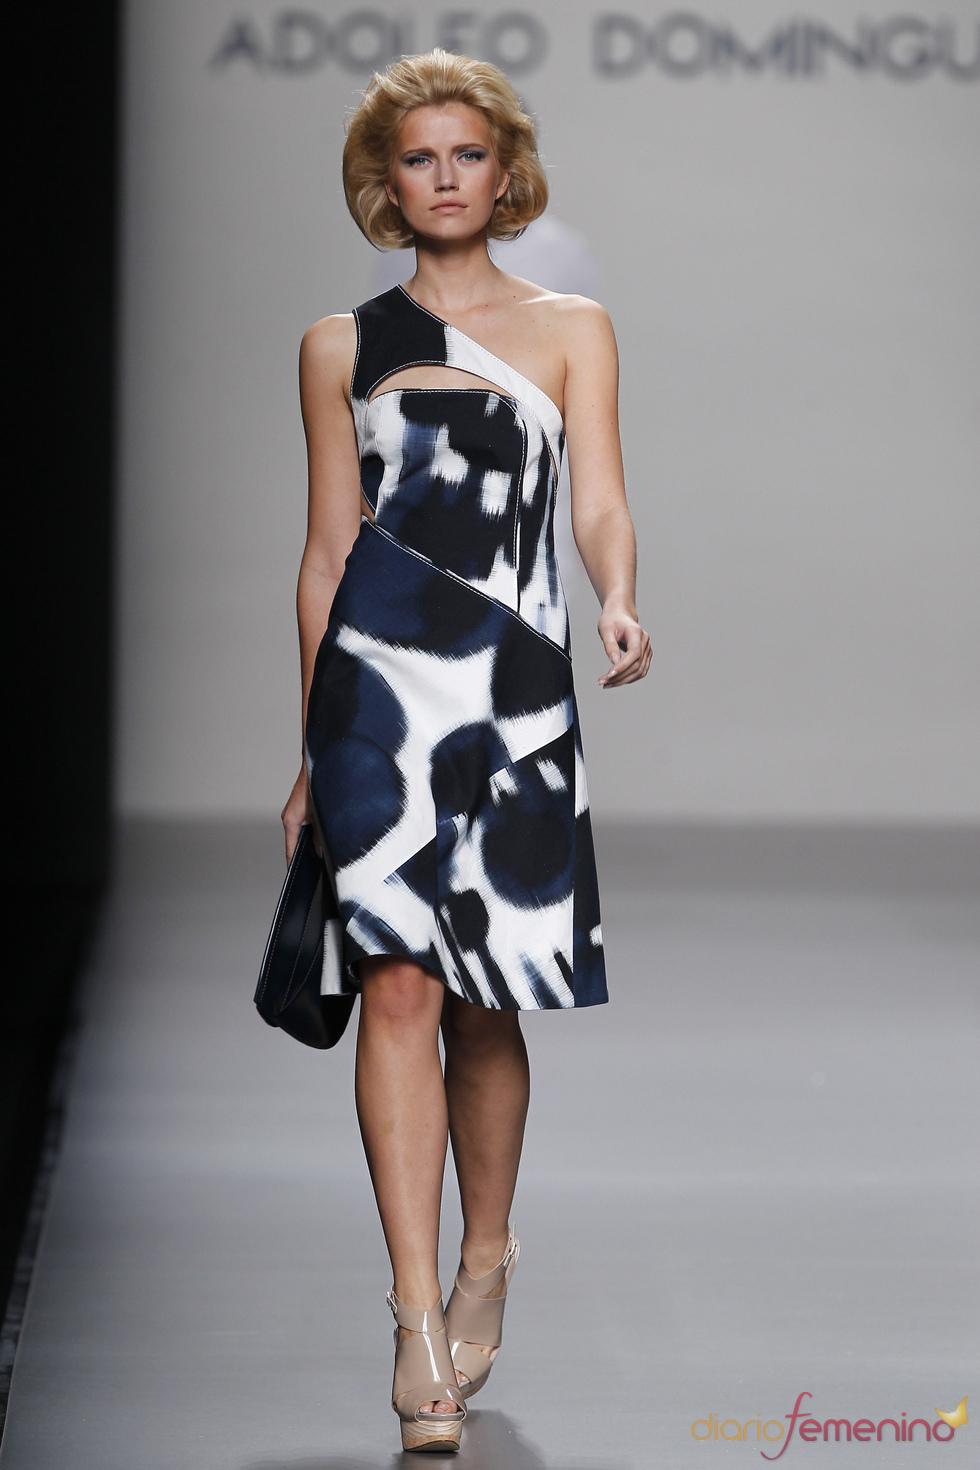 Desfile de adolfo dom nguez en la madrid fashion week for Adolfo dominguez oficinas madrid